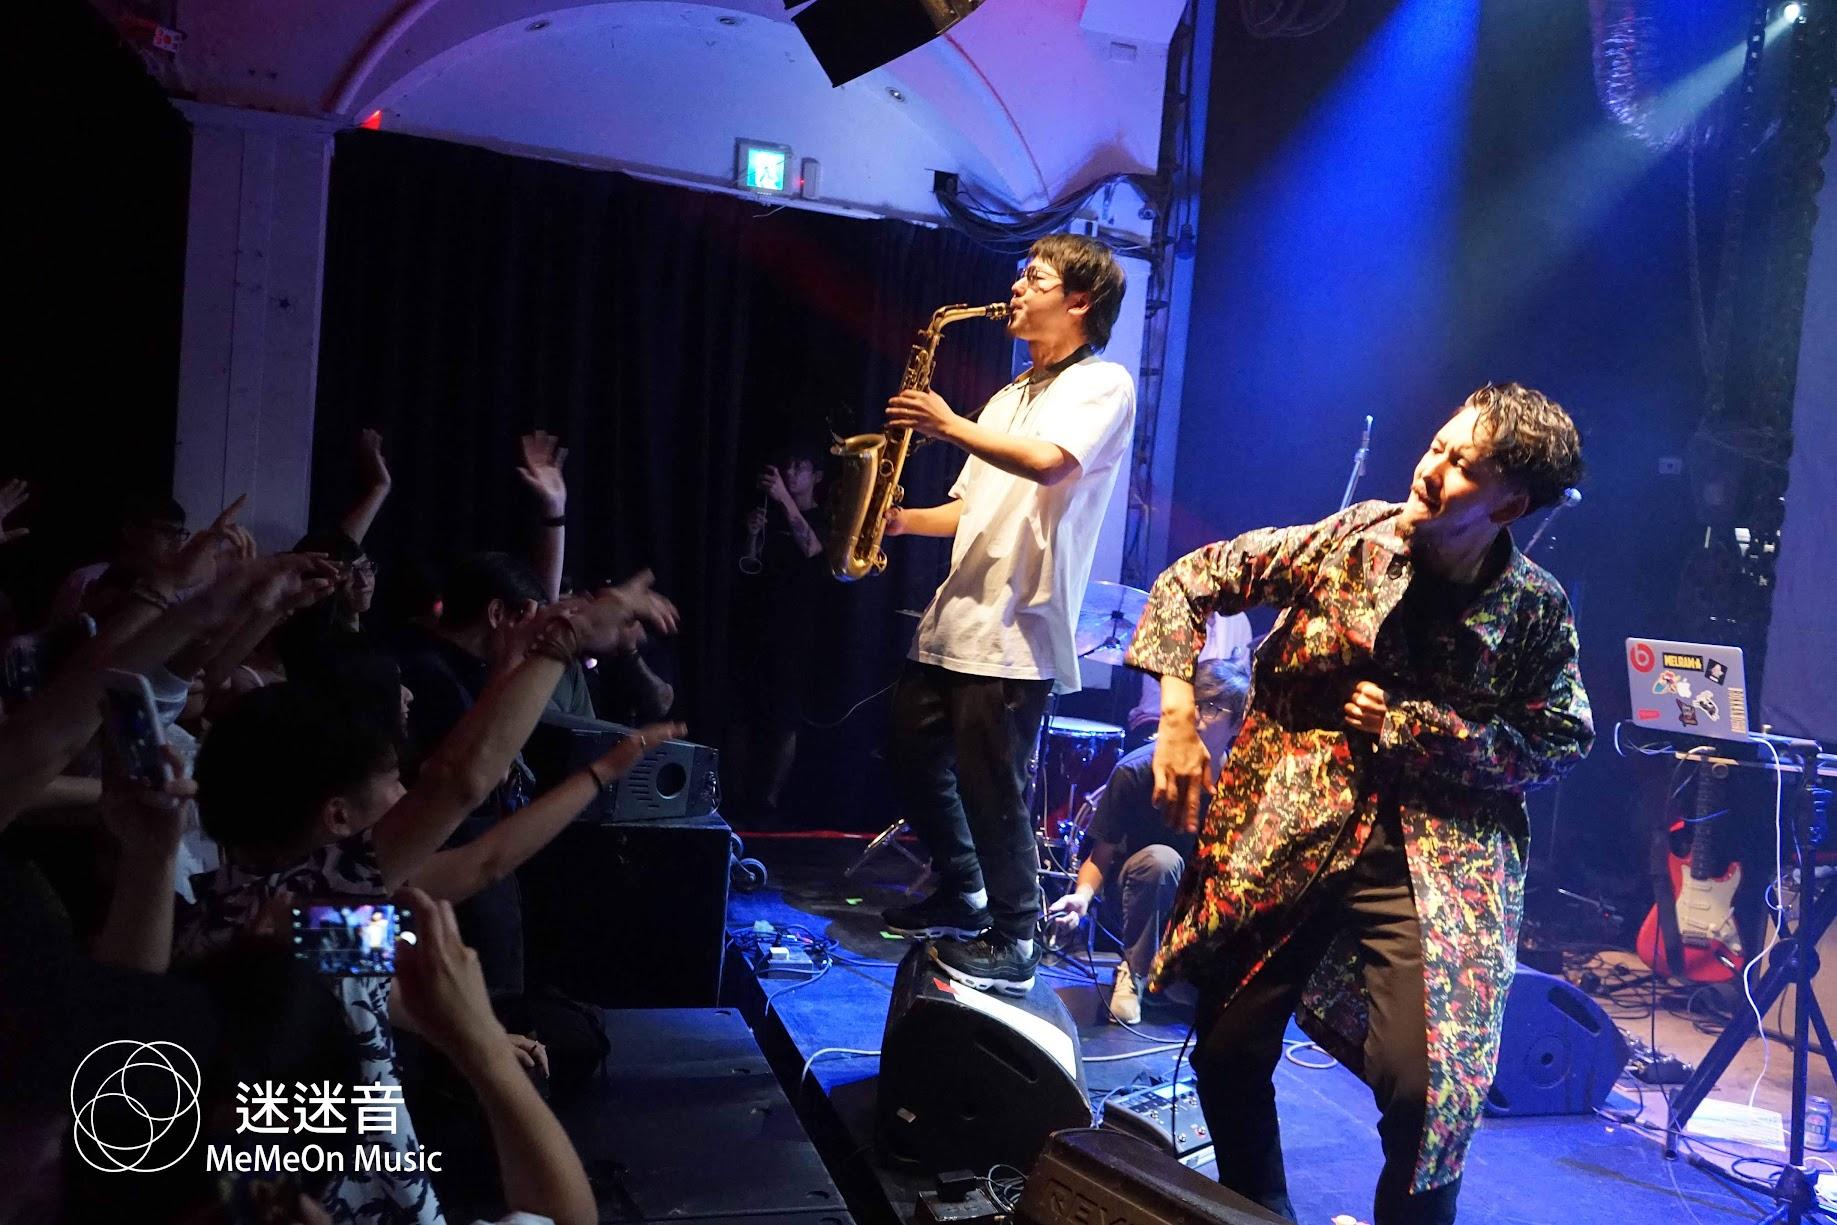 【迷迷歌單】TOKYO FINEST Vol.1 – yahyel/WONK